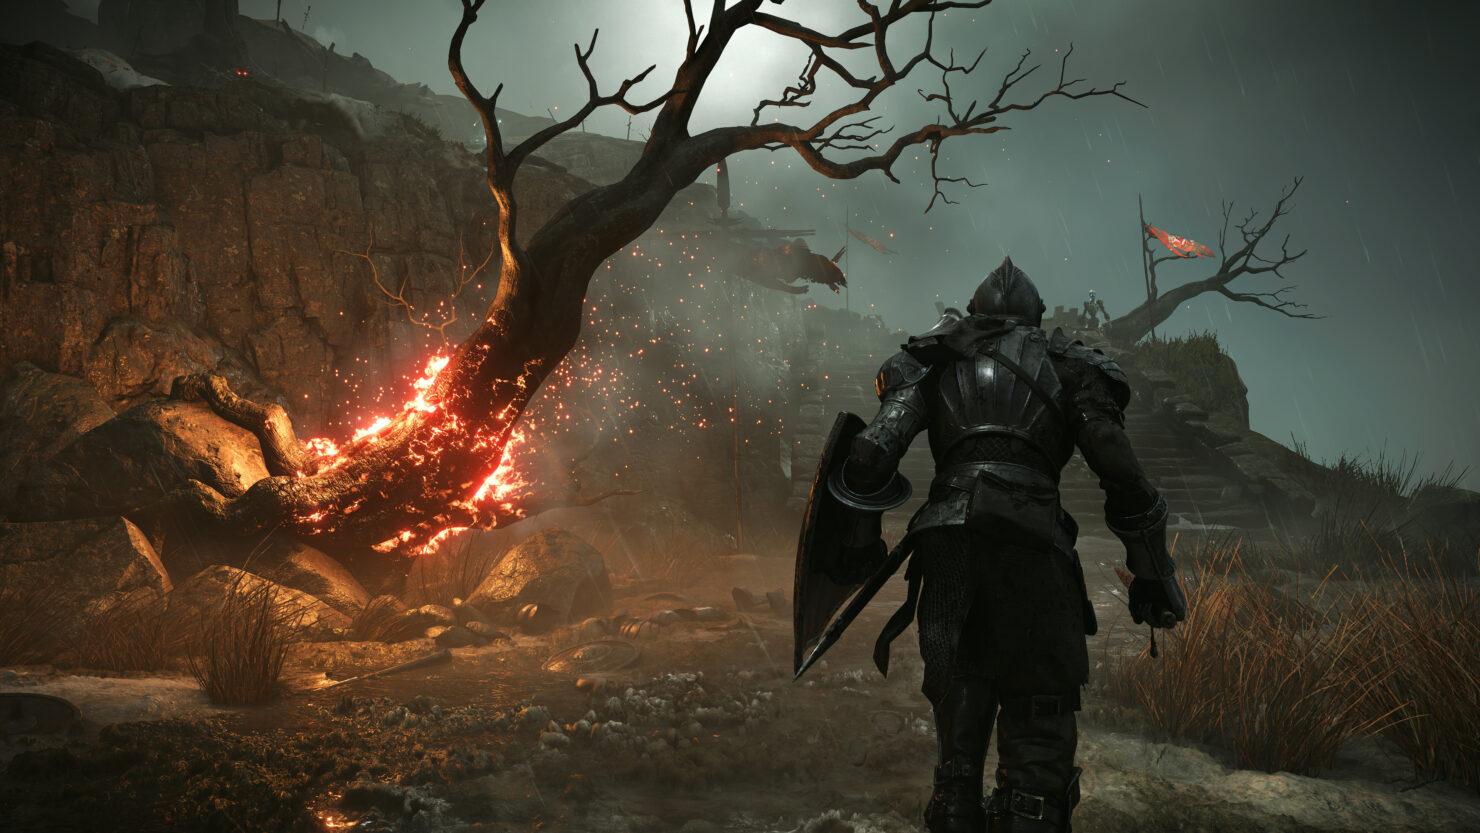 PS5 Demon's Souls menu theme music miles morales